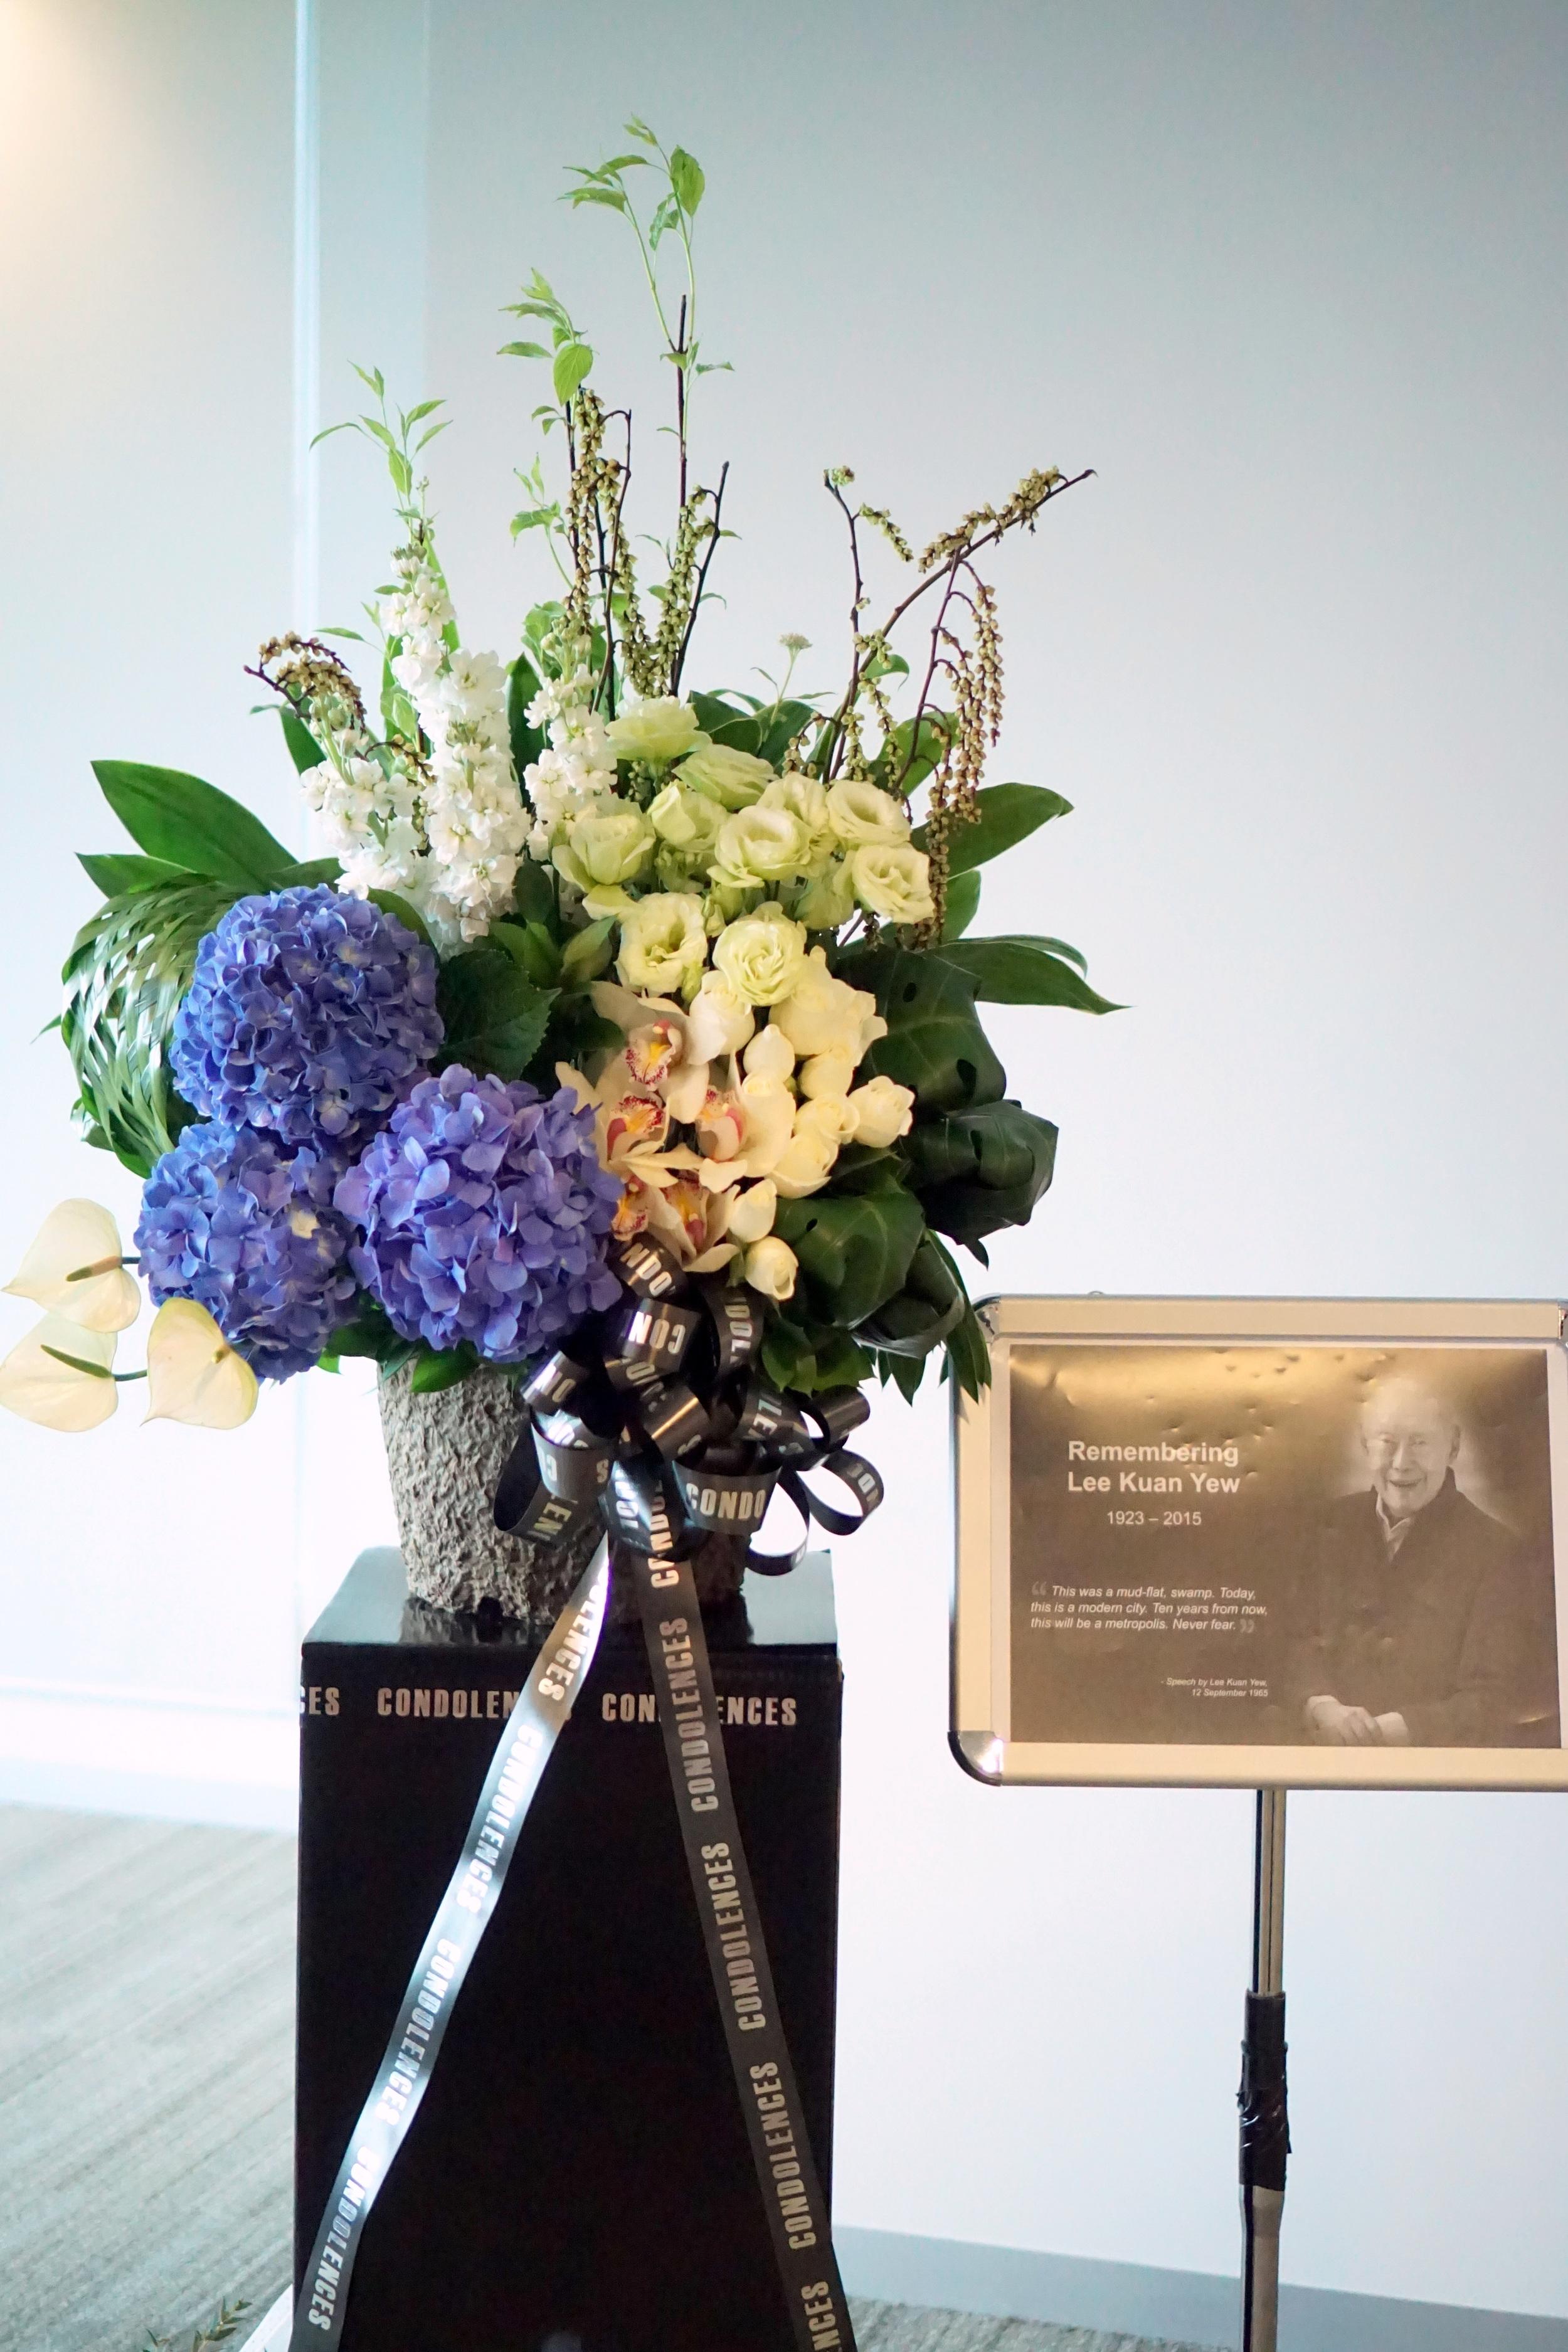 Condolence 1.JPG